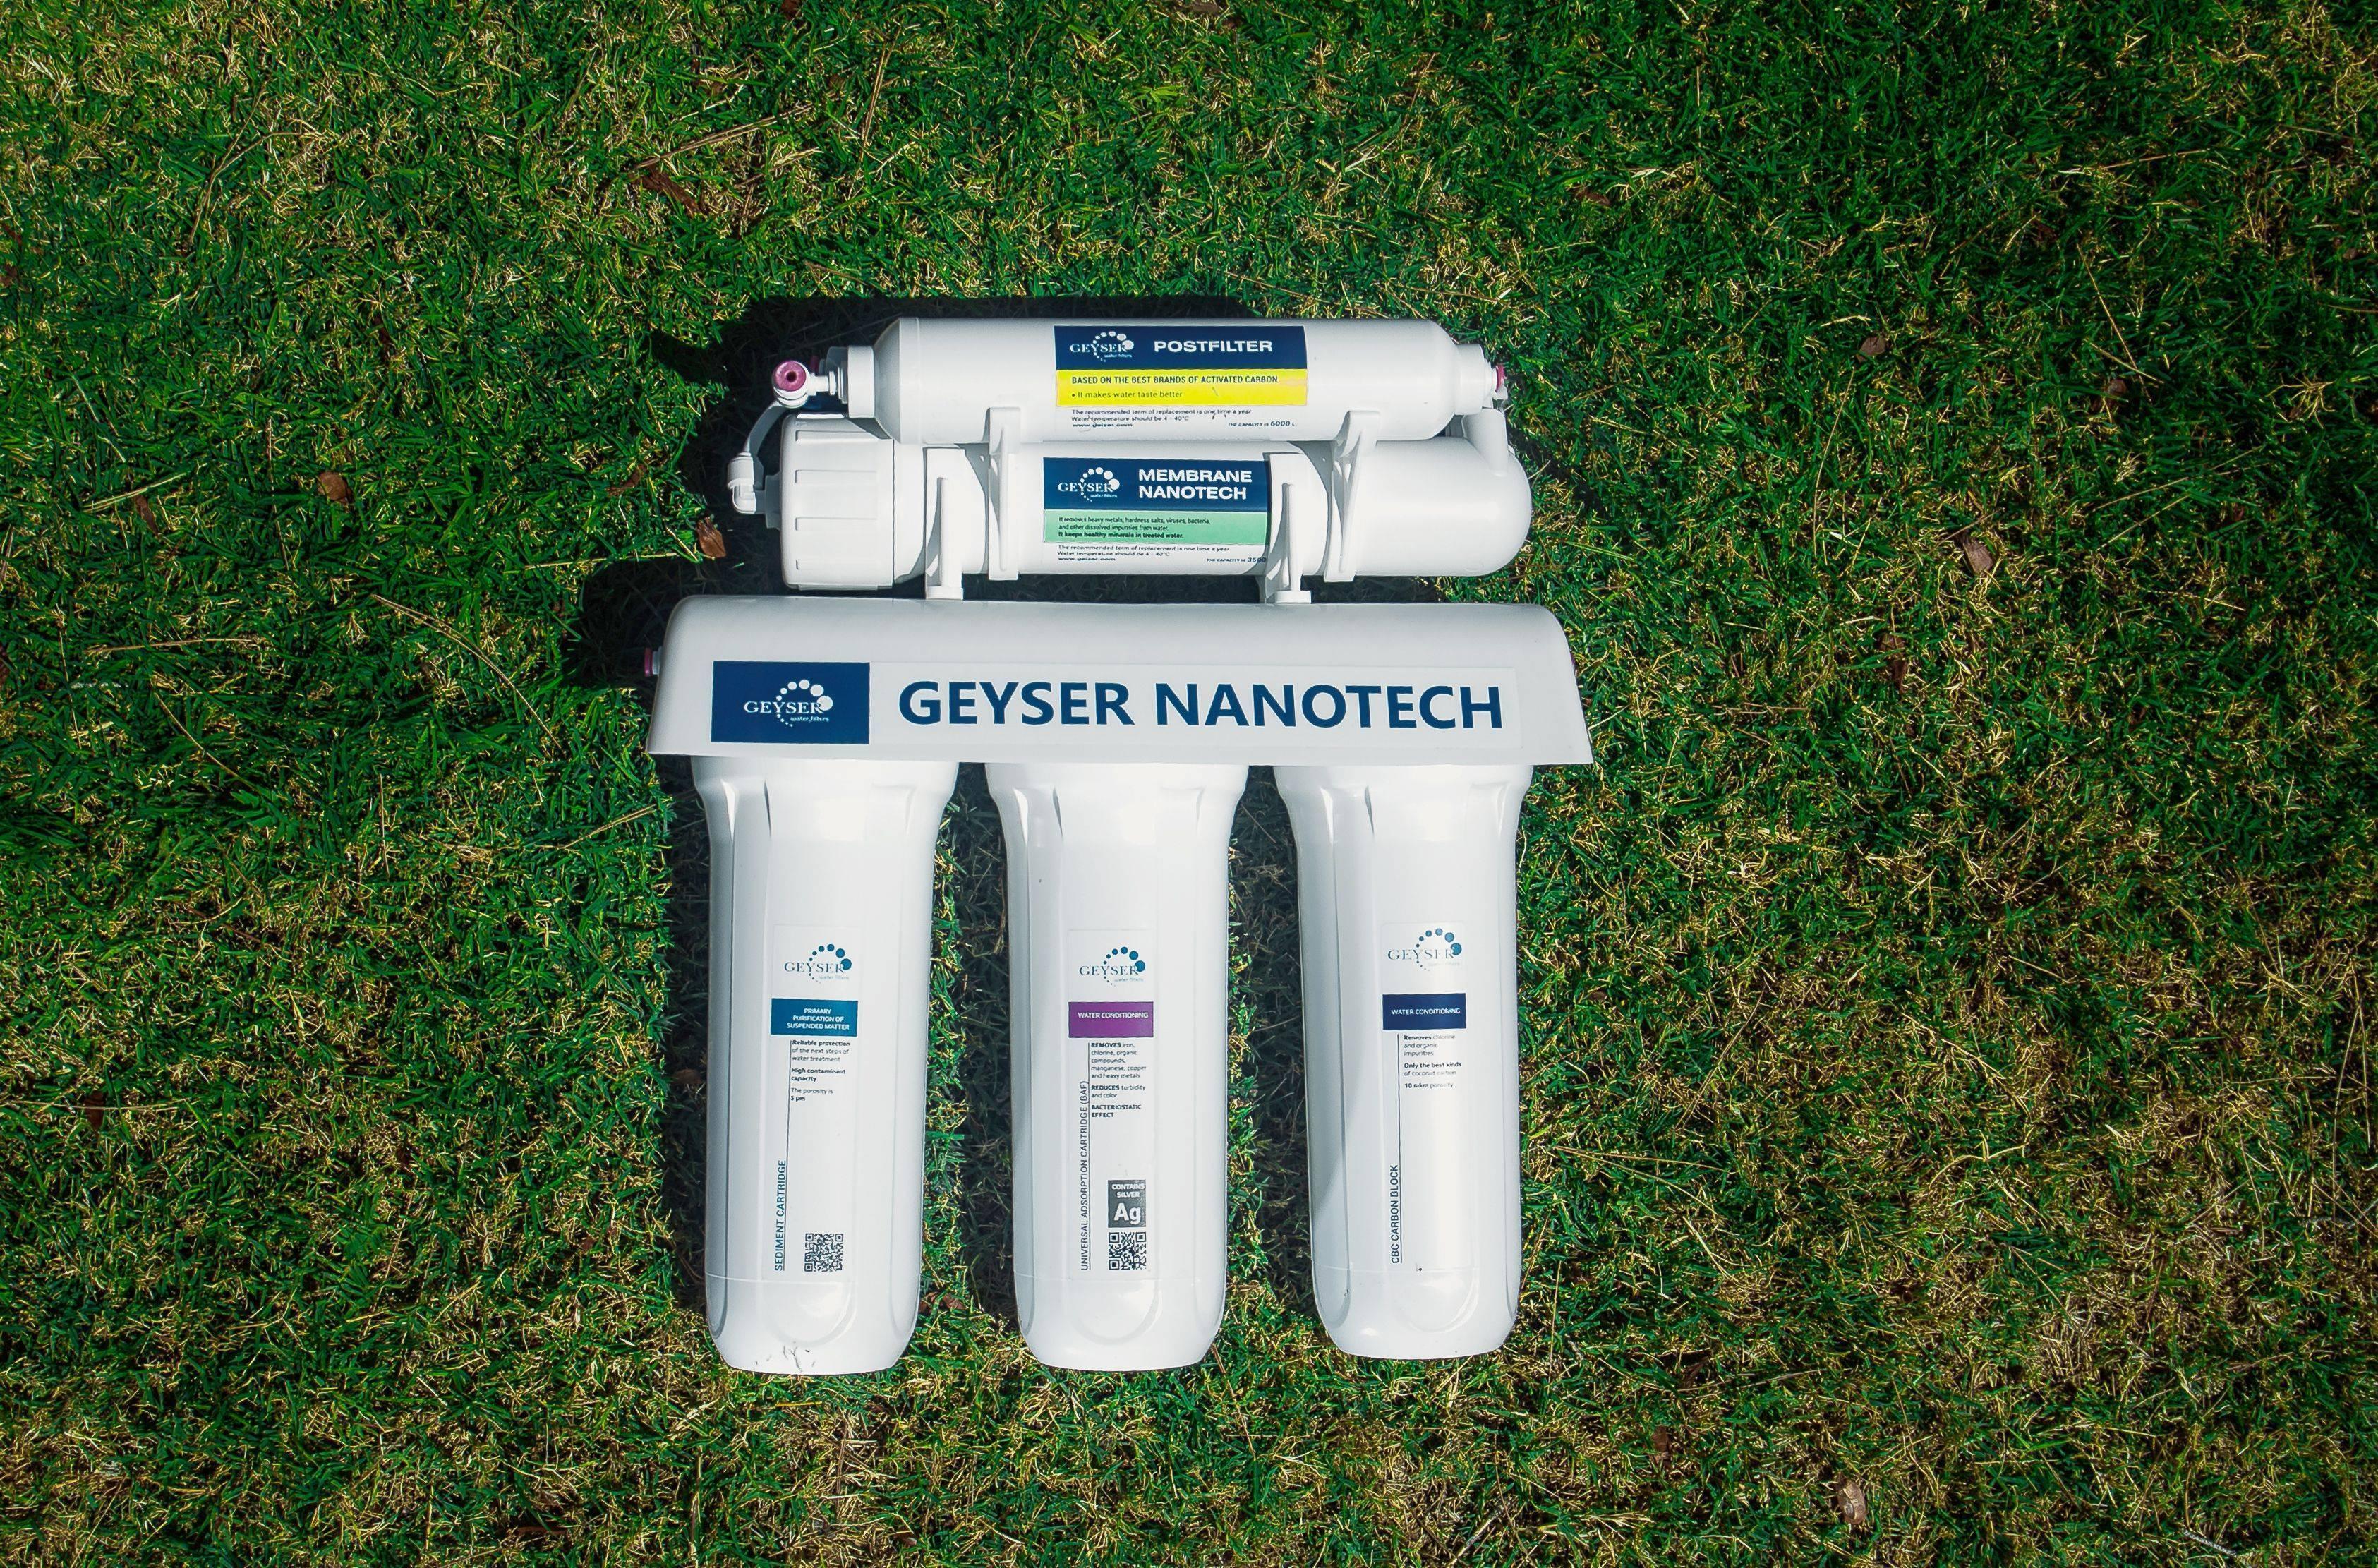 Sistema de osmosis inversa GEYSER NANOTECH